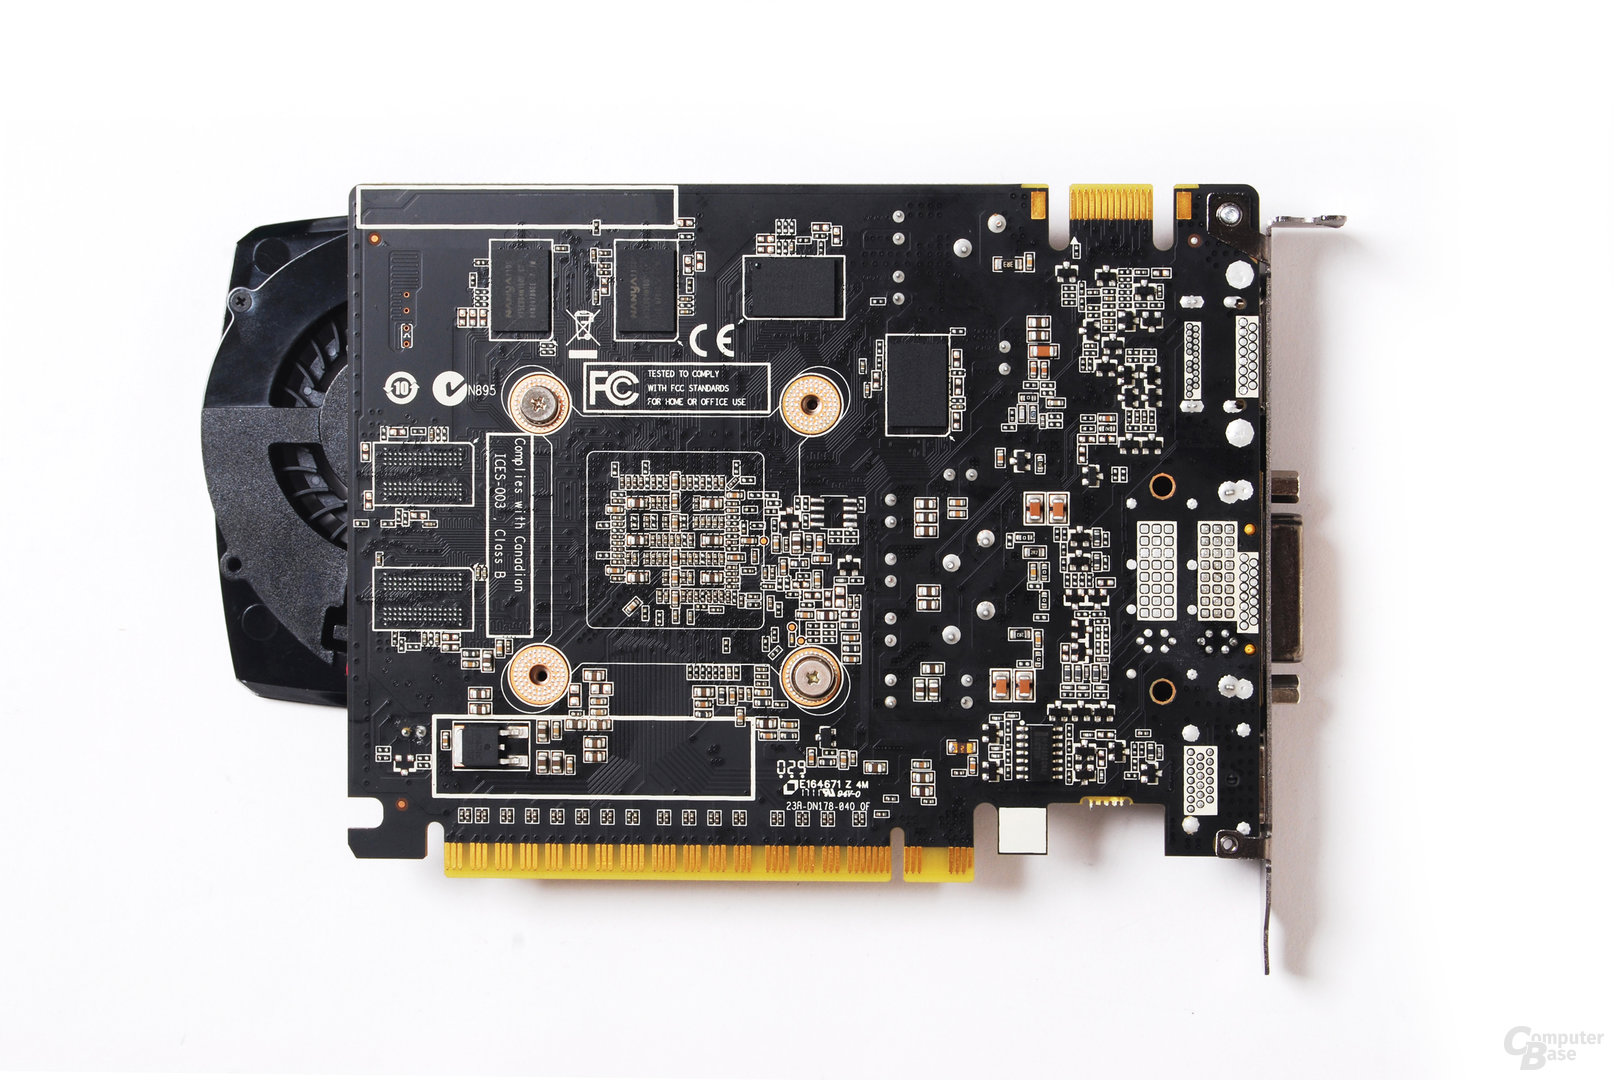 Zotac GeForce GTS 450 Eco Edition